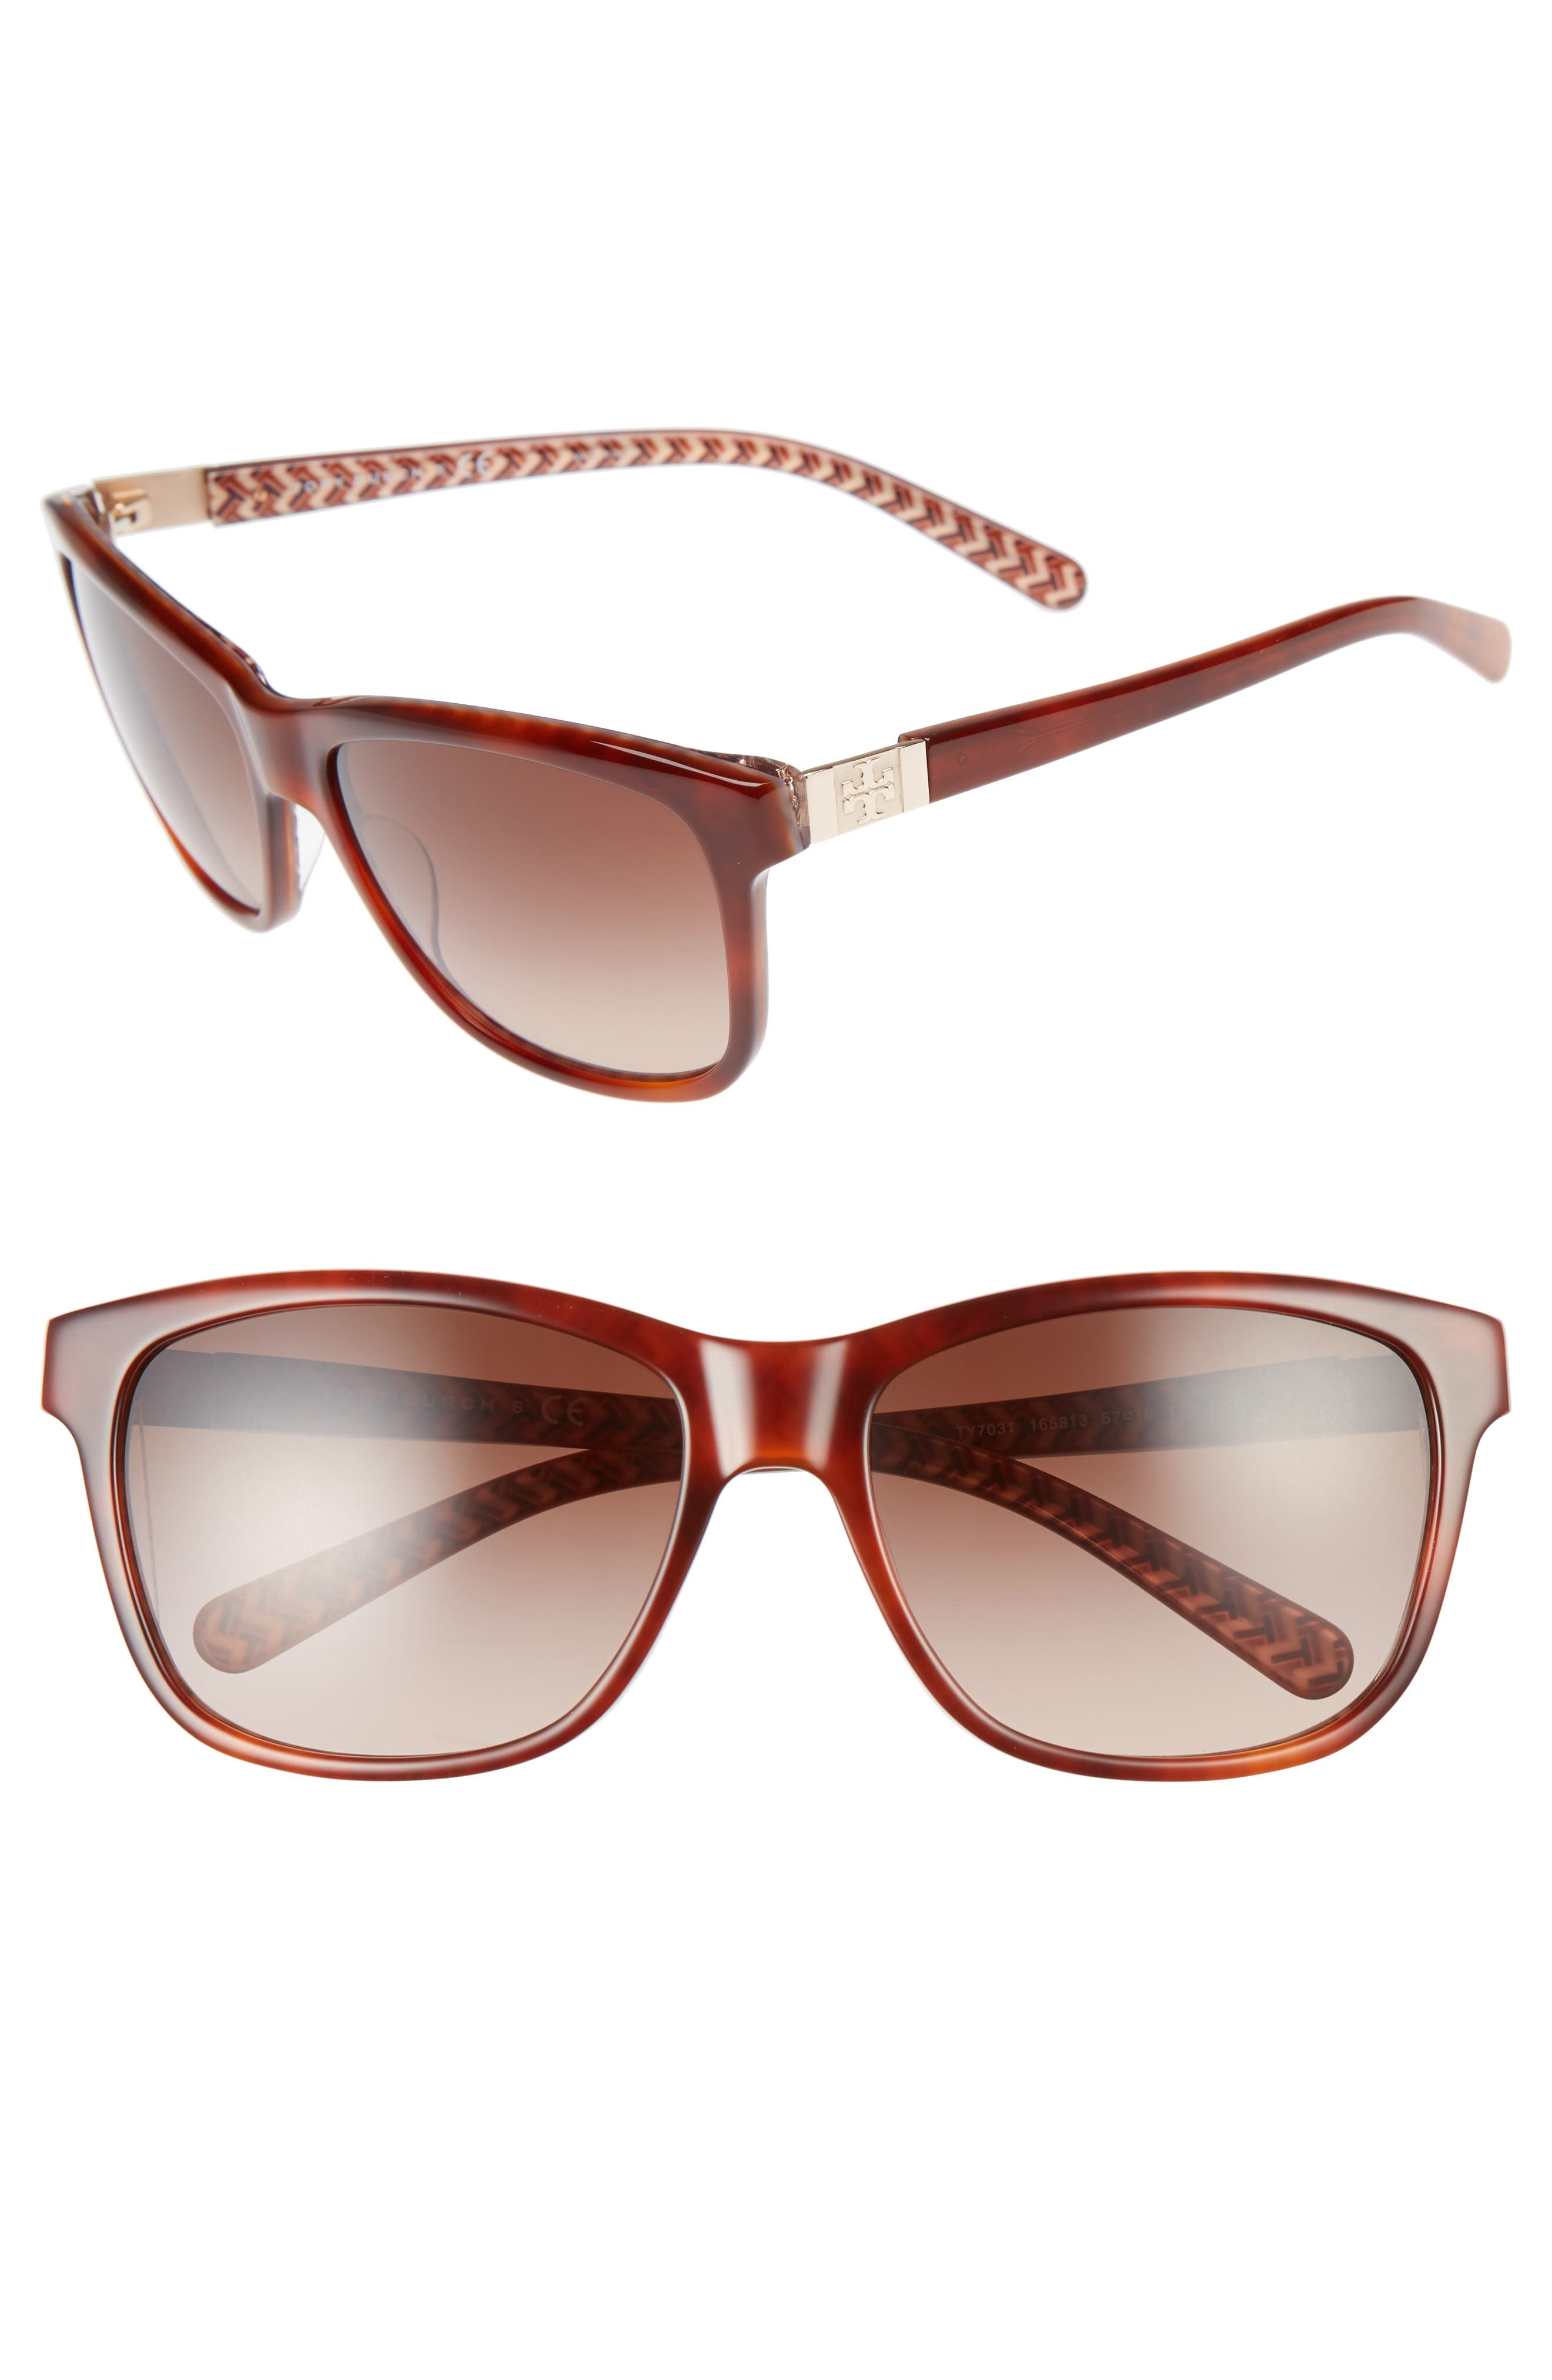 57mm Gradient Sunglasses,                         Main,                         color, Tortoise/ Orange Zig Zag